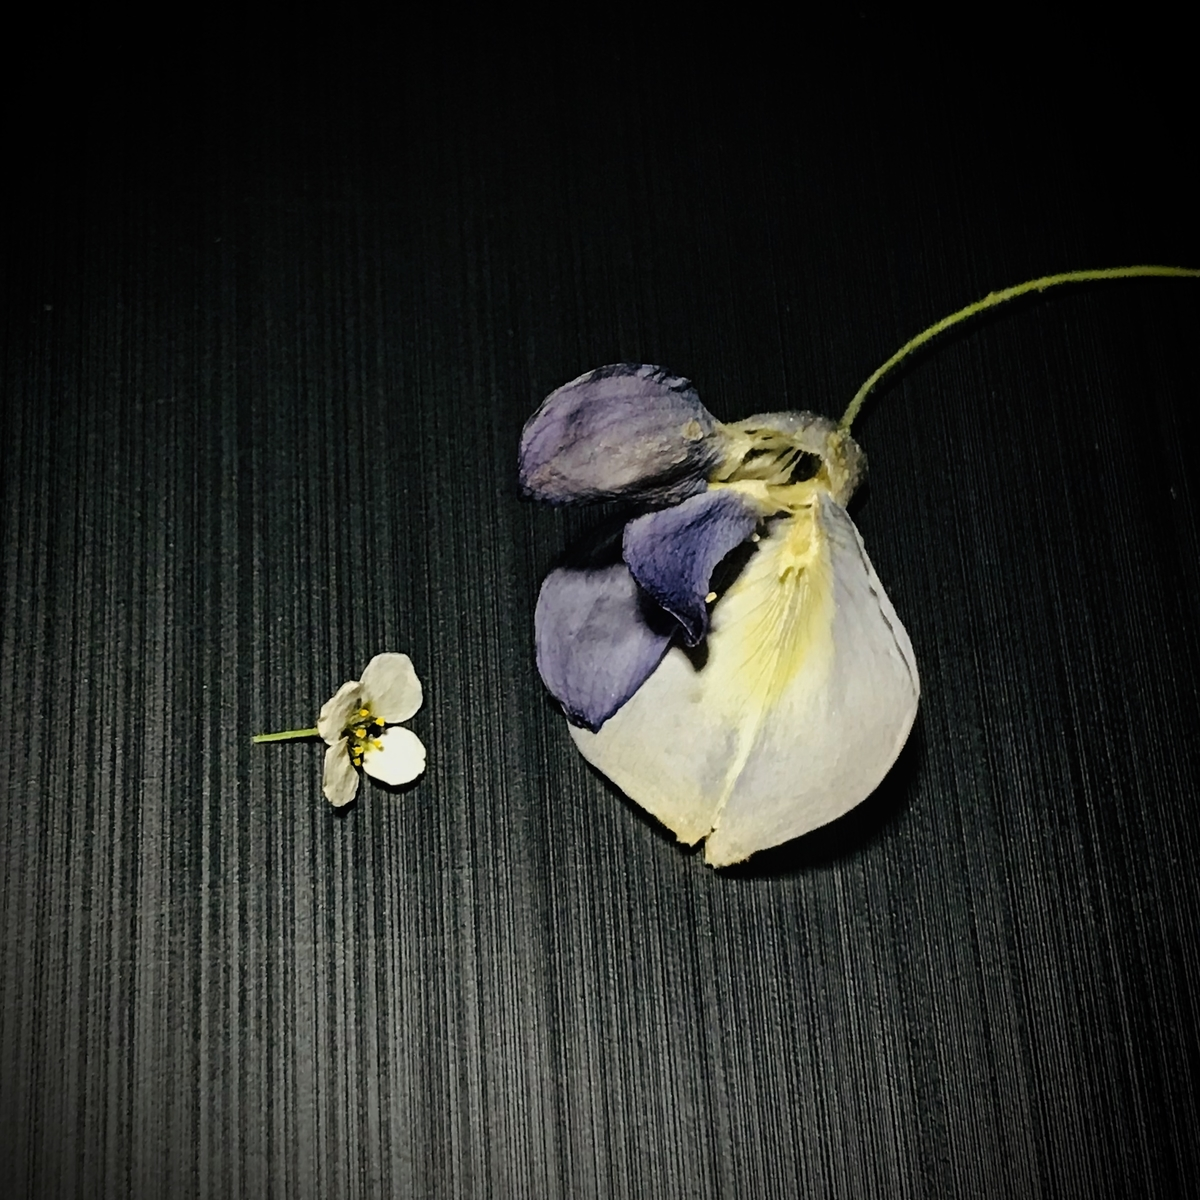 f:id:asunaro-flower:20200506235912j:plain